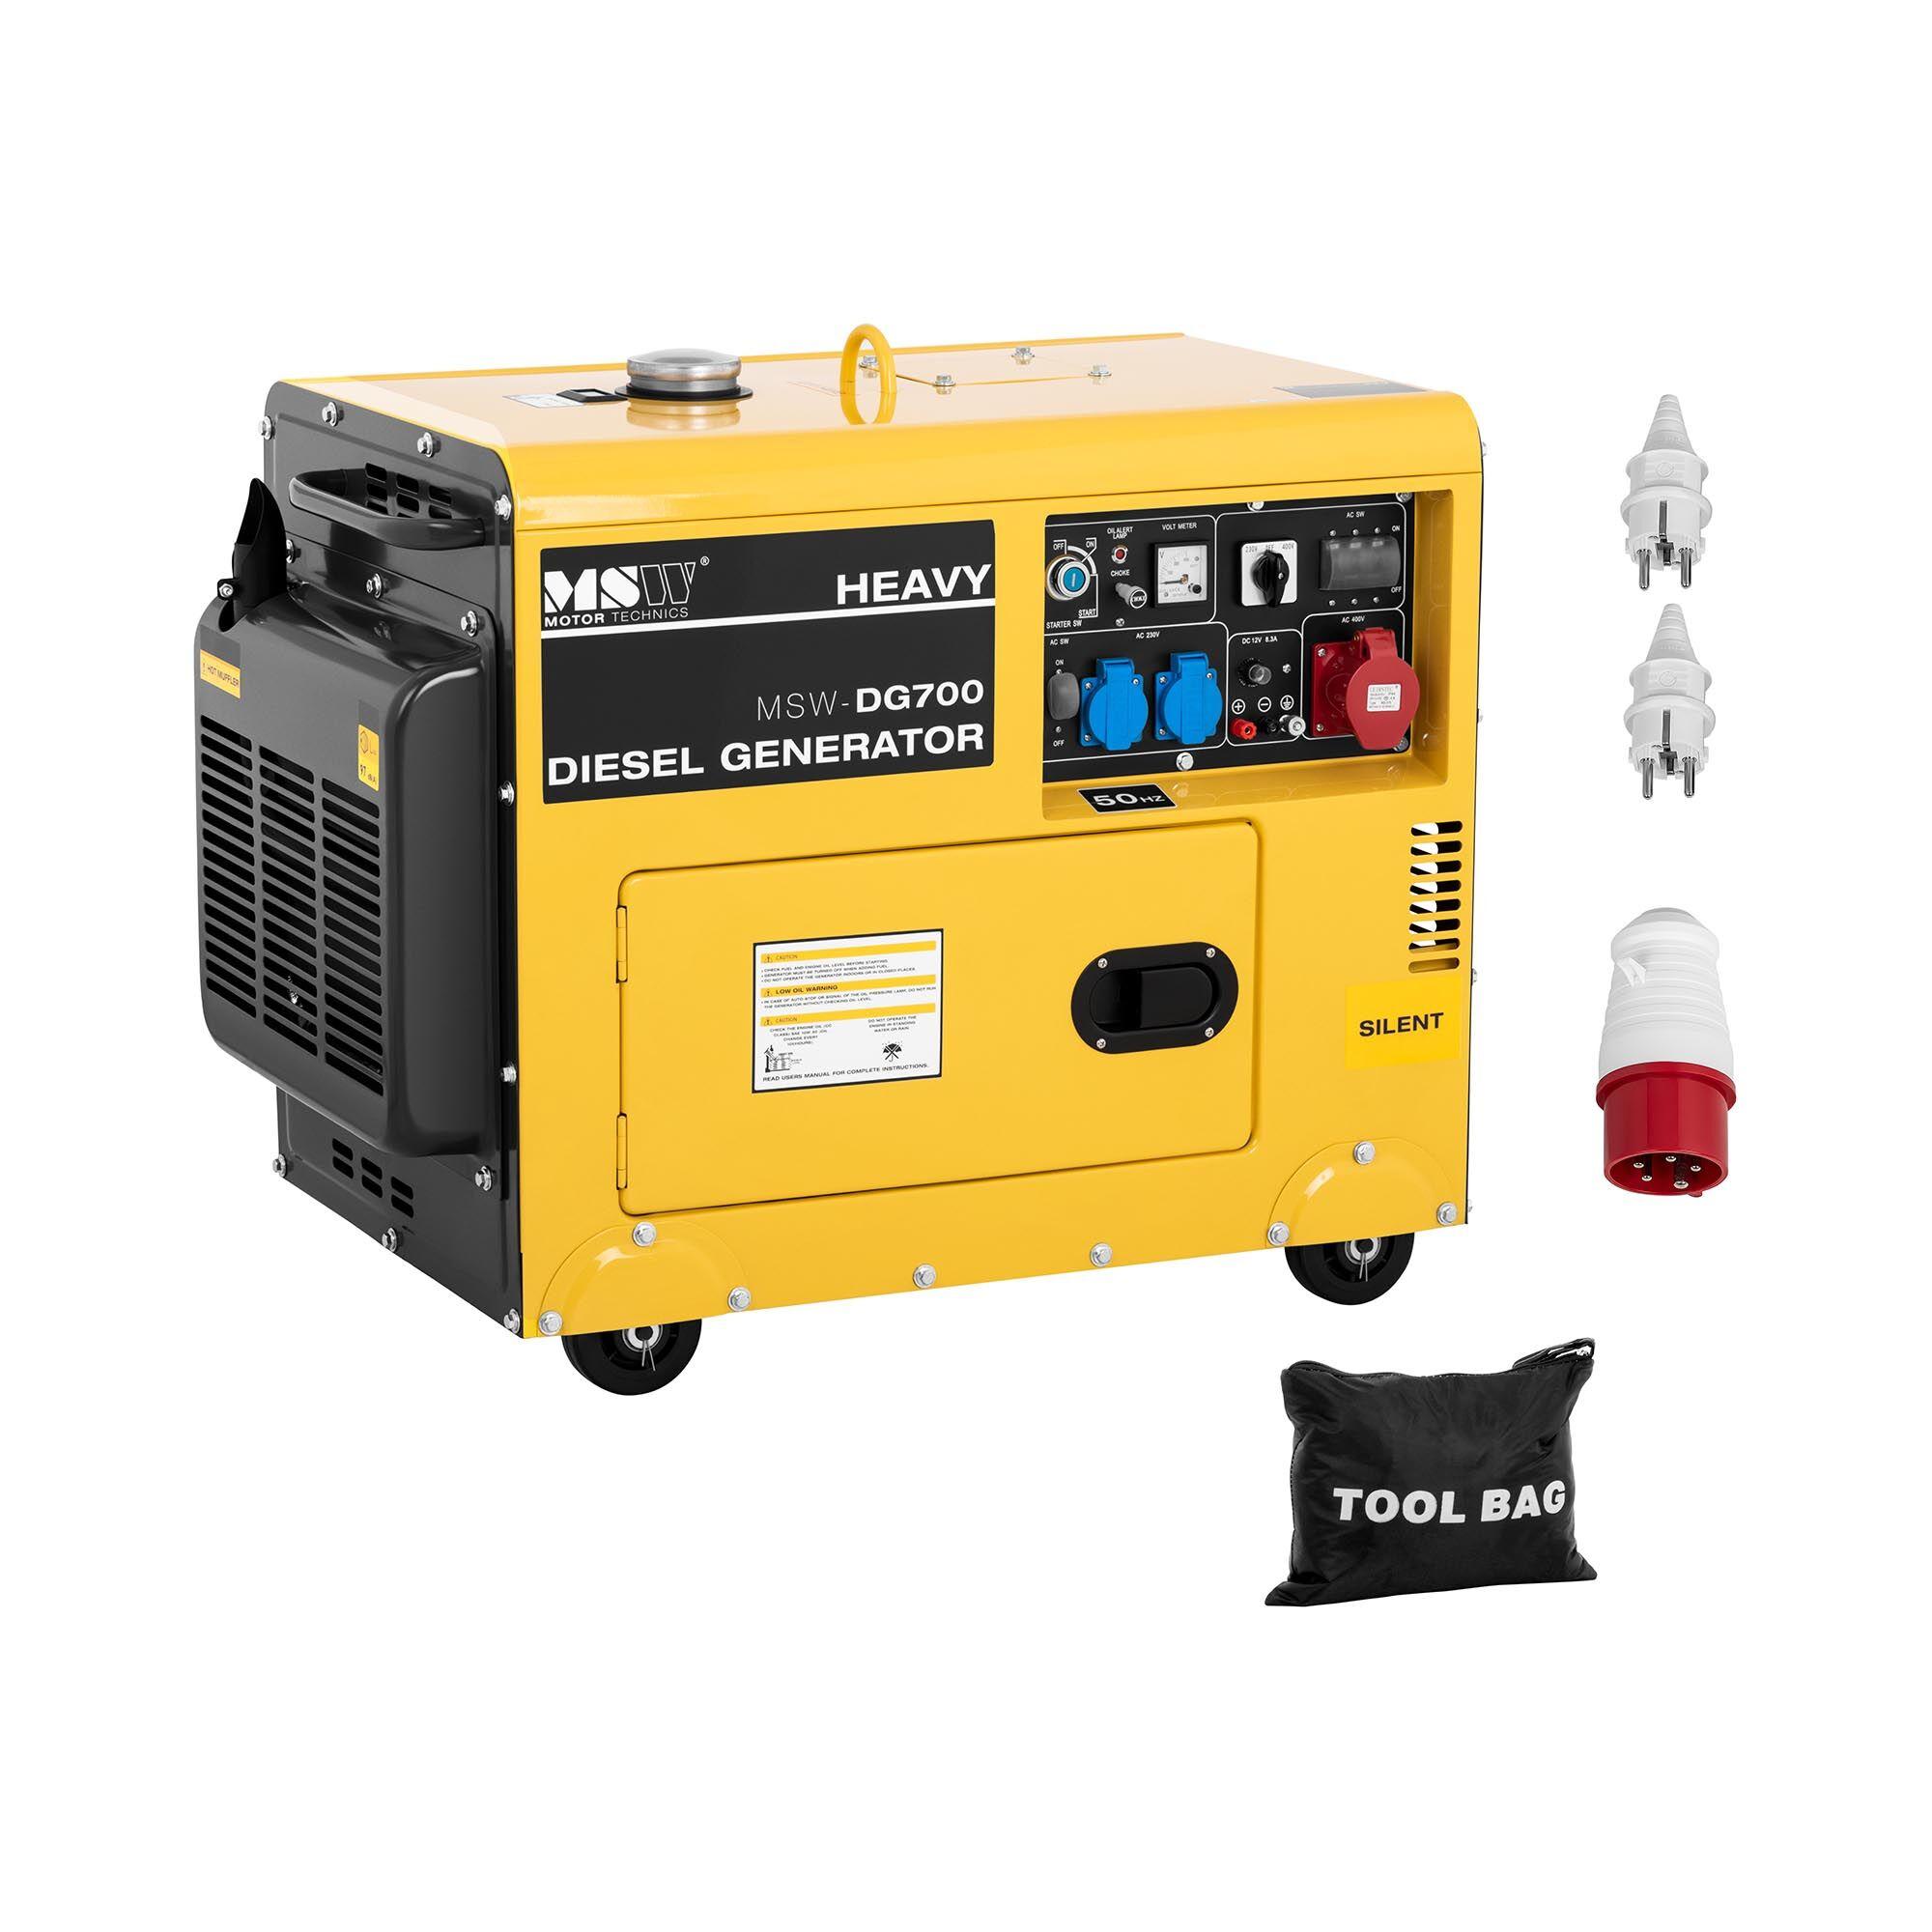 MSW Gruppo elettrogeno diesel - 4.400 W - 14,5 L - 230/400 V -DG700